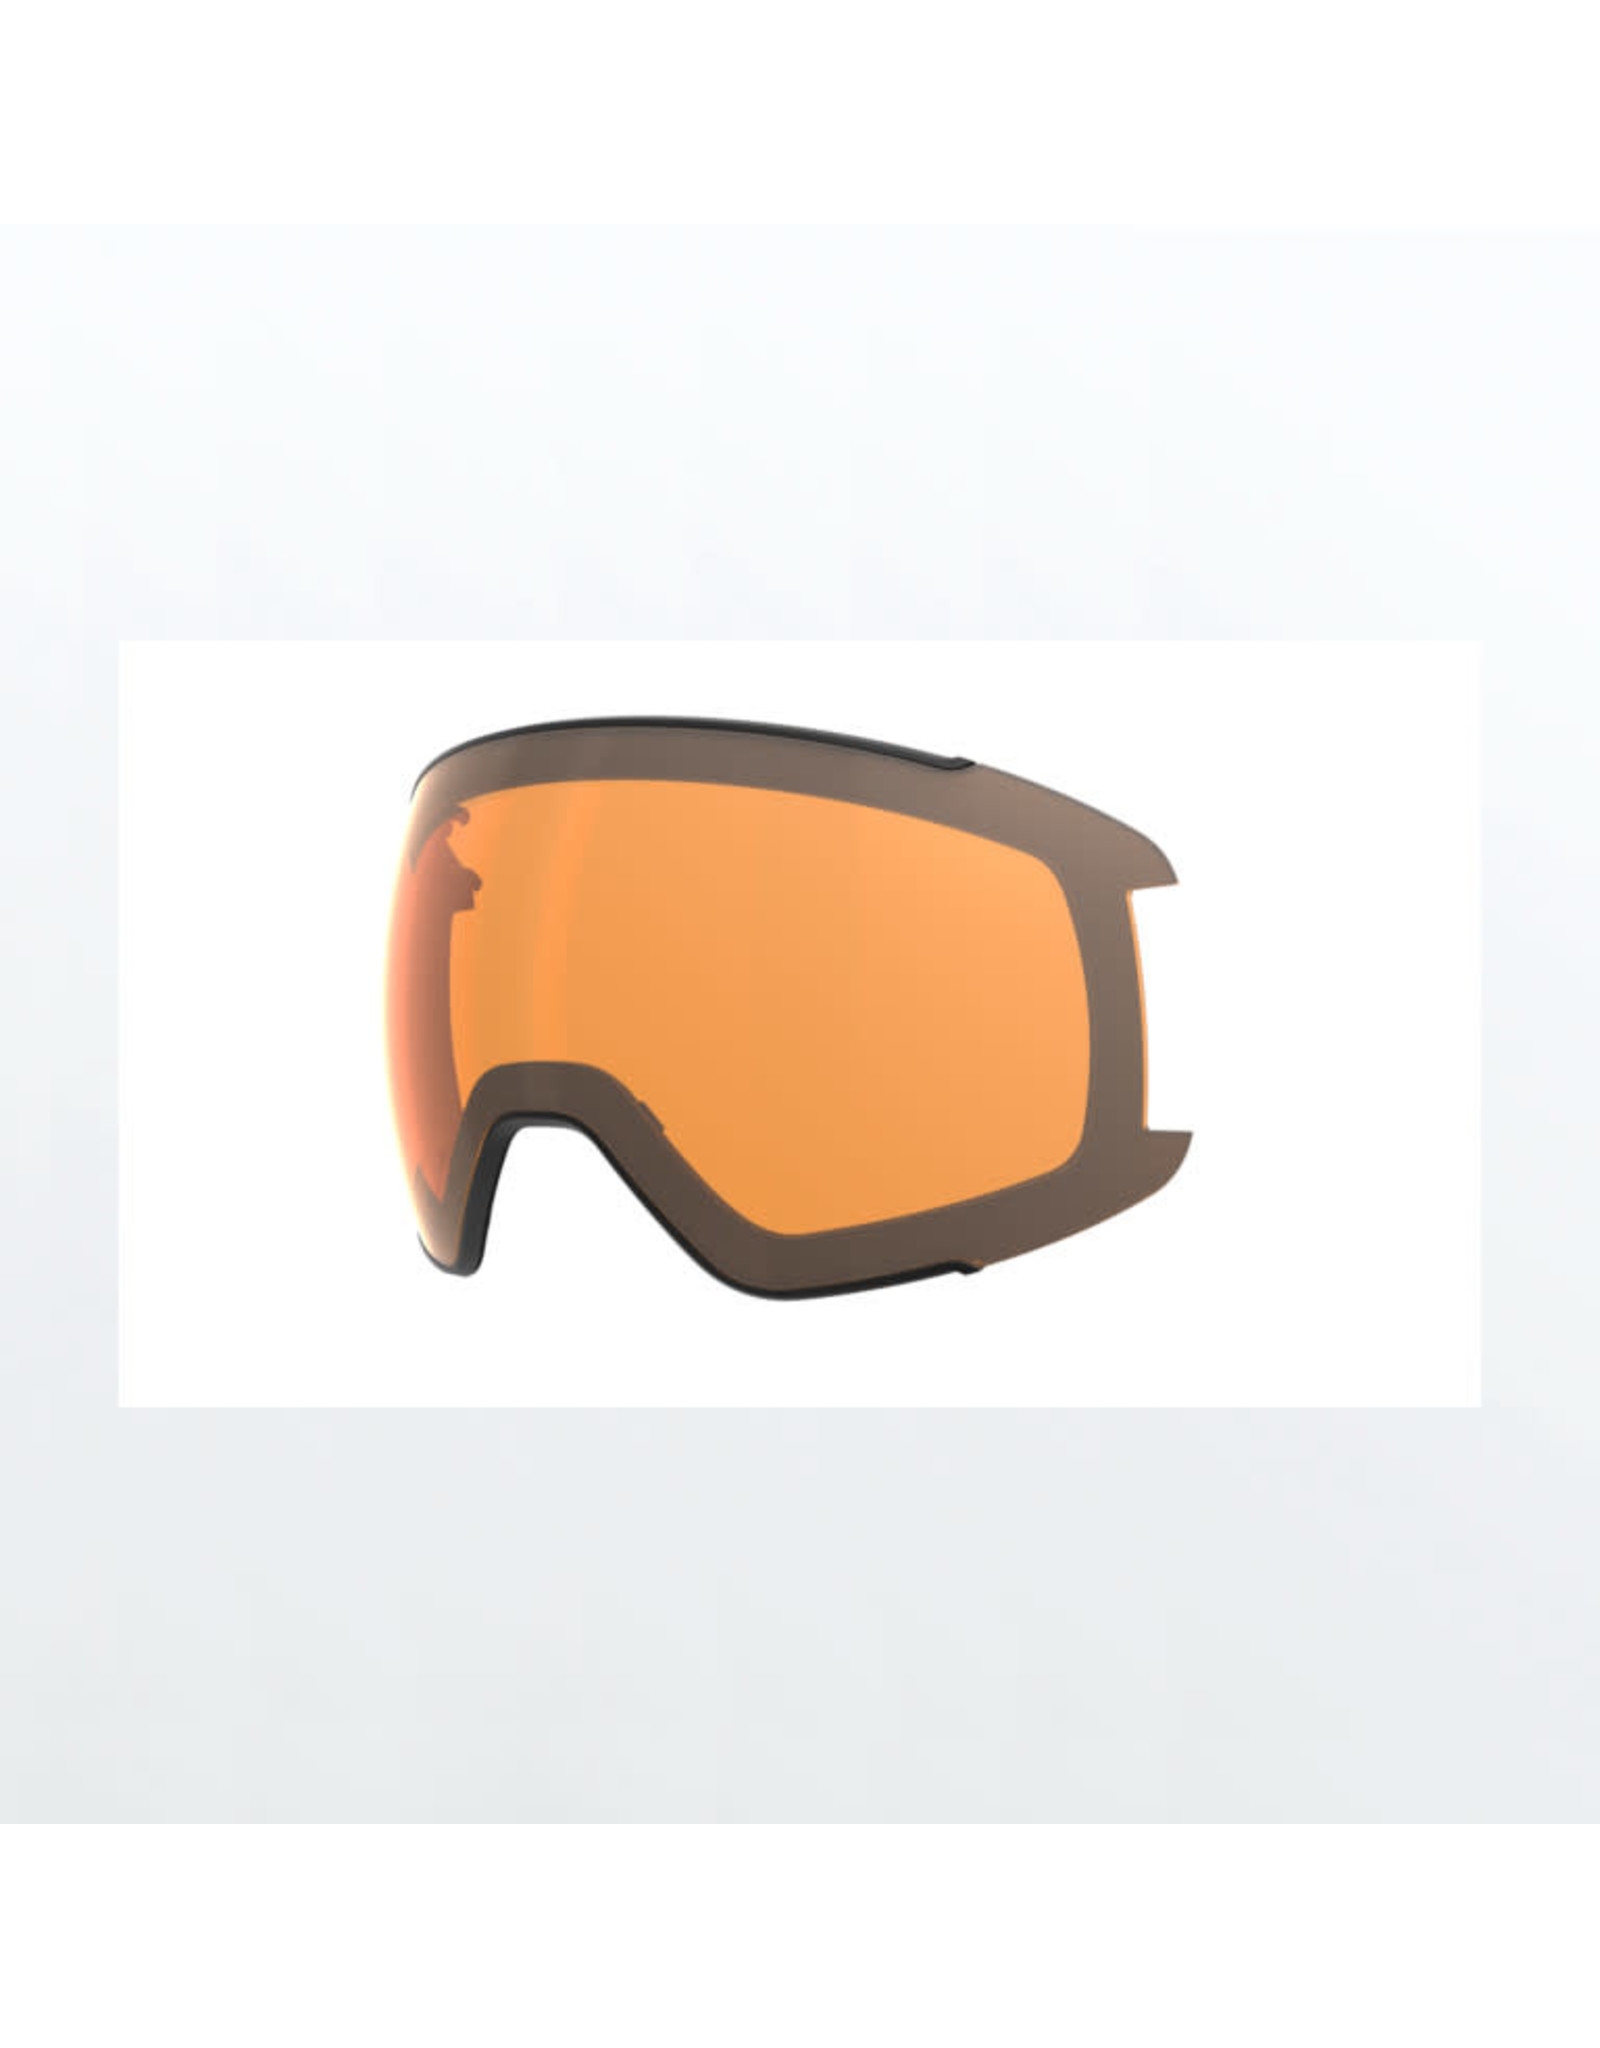 HEAD Magnify Kore + Spare Lens